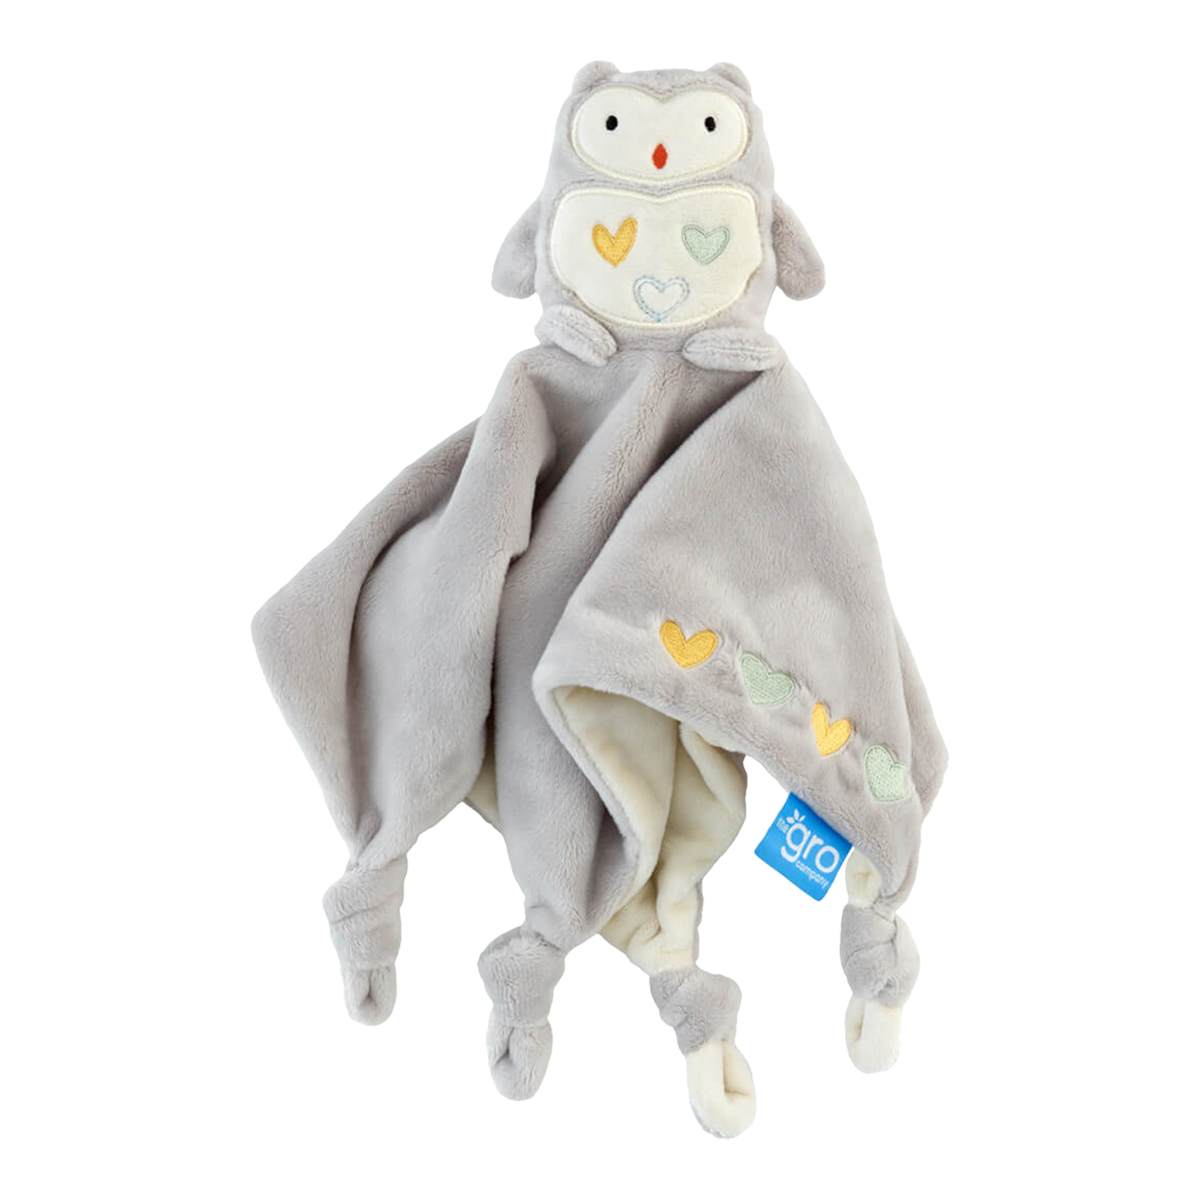 ollie-the-owl-grocomforter-in-grey-soft-velour